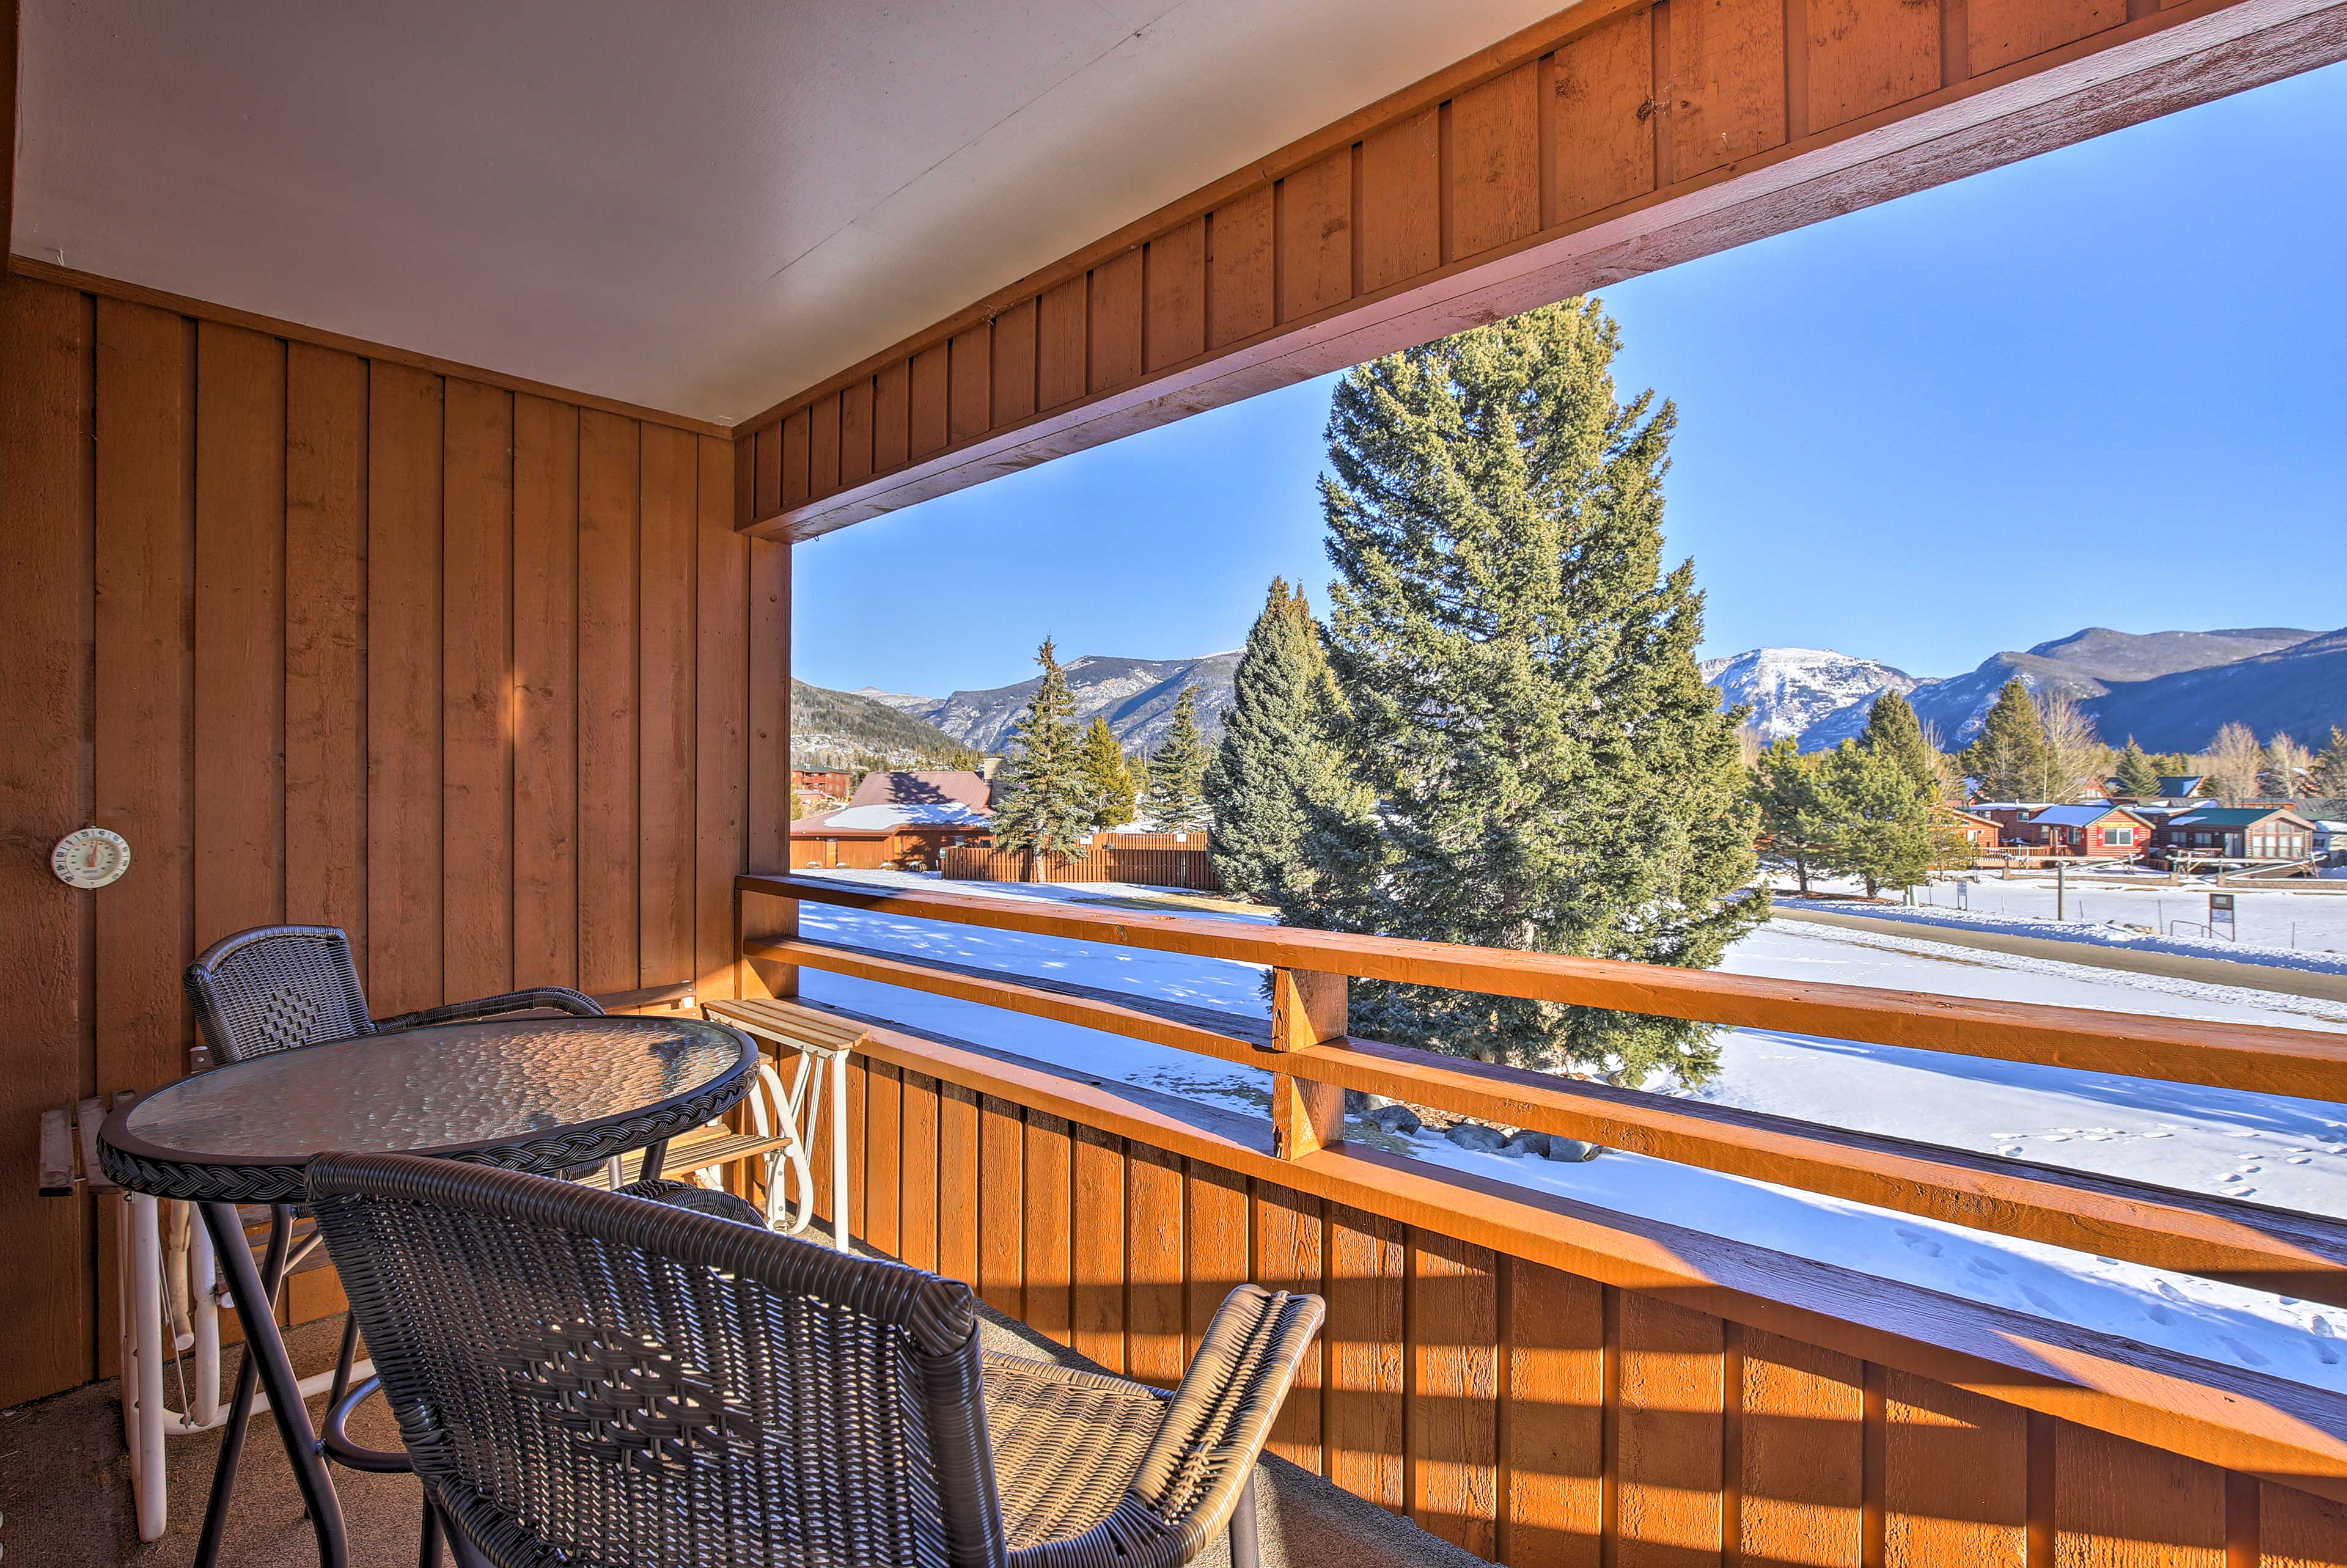 Spring skiing awaits you at Granby Ranch just a 30-minute drive away!